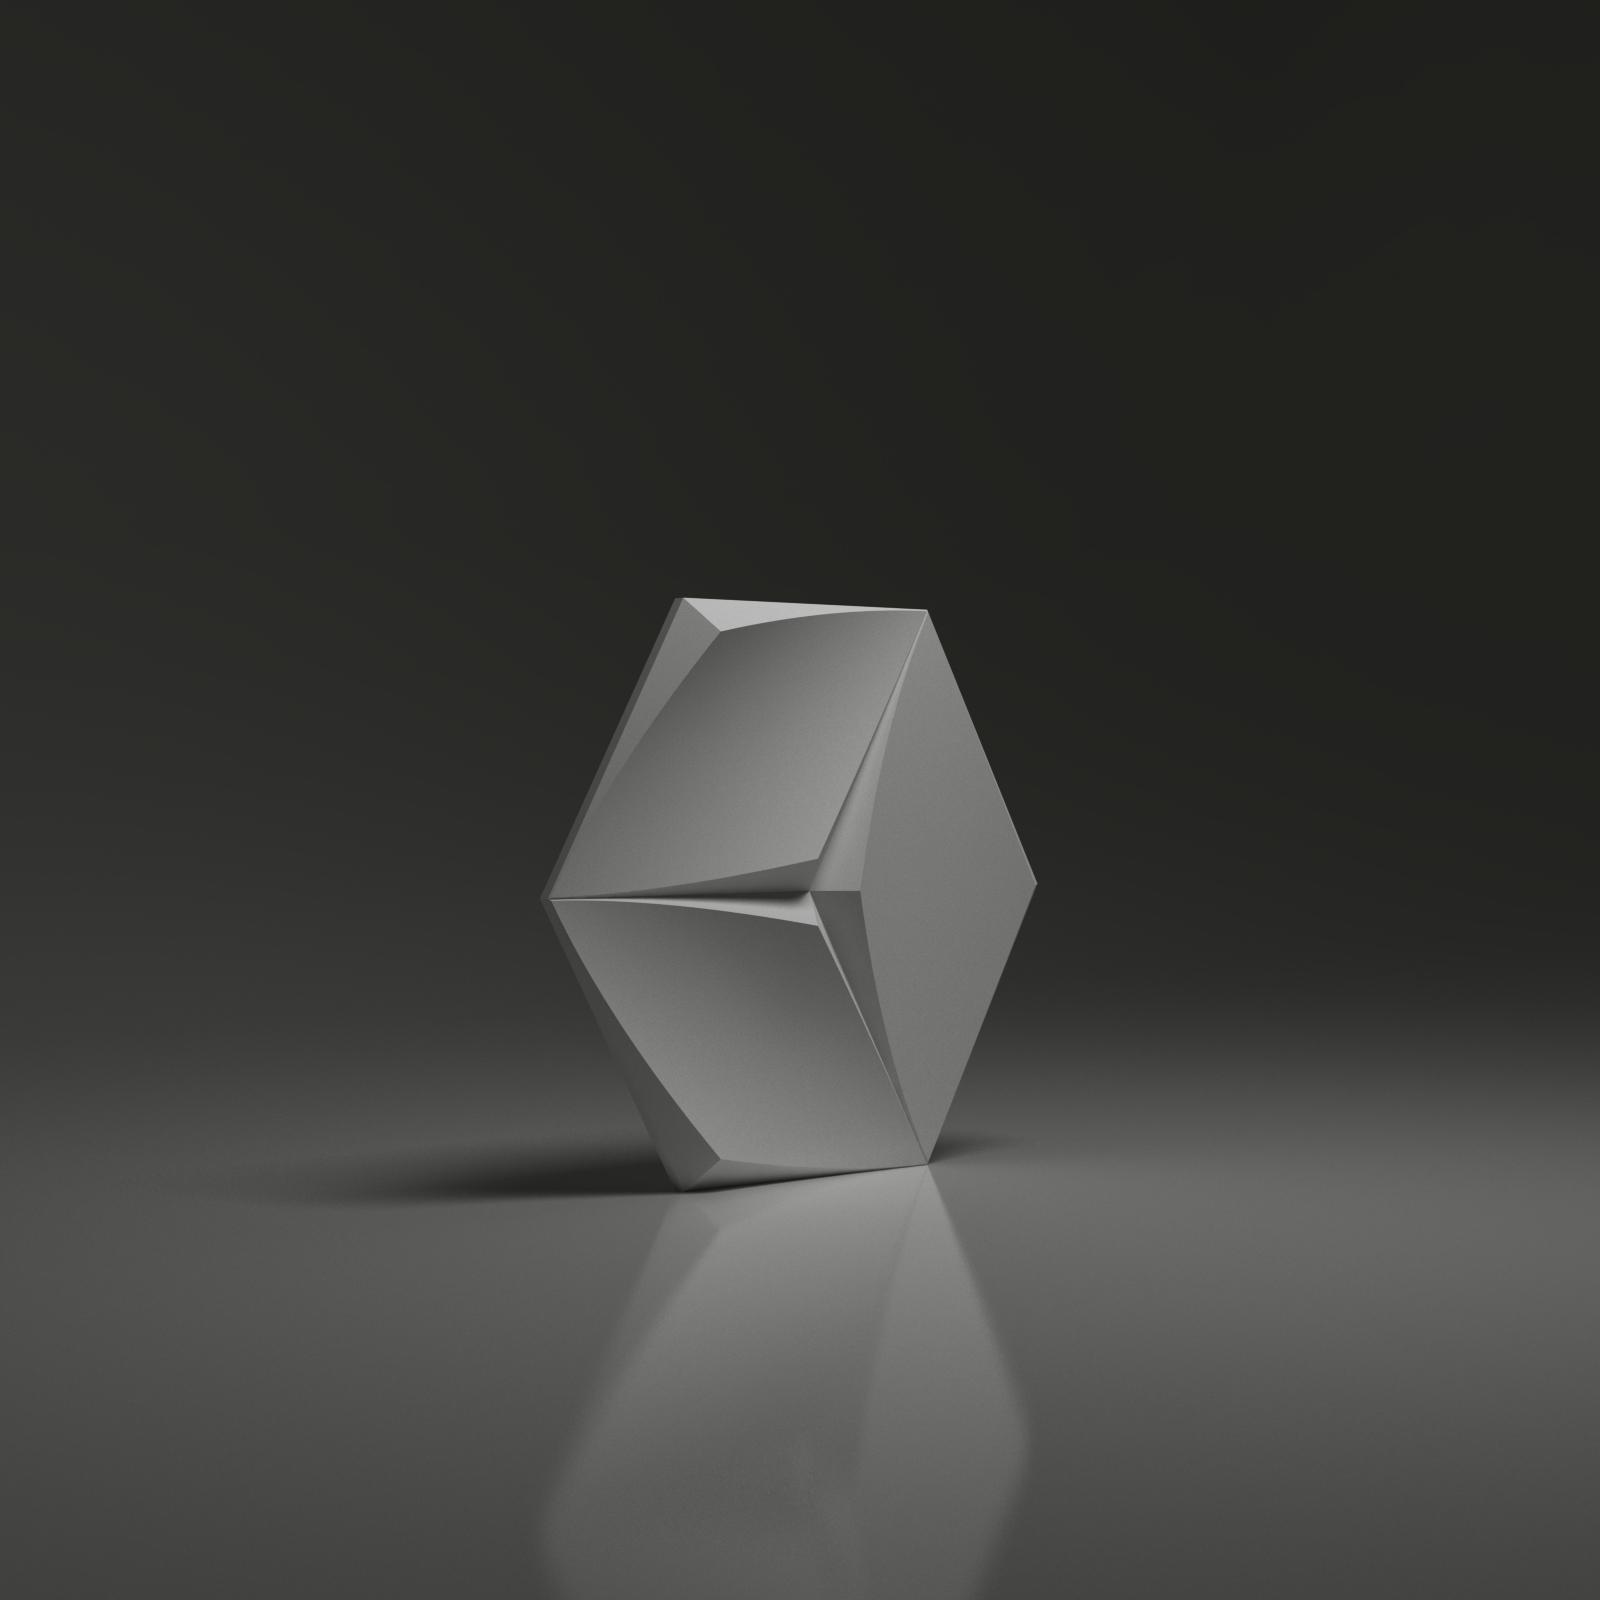 hexagon-leaf-wizu